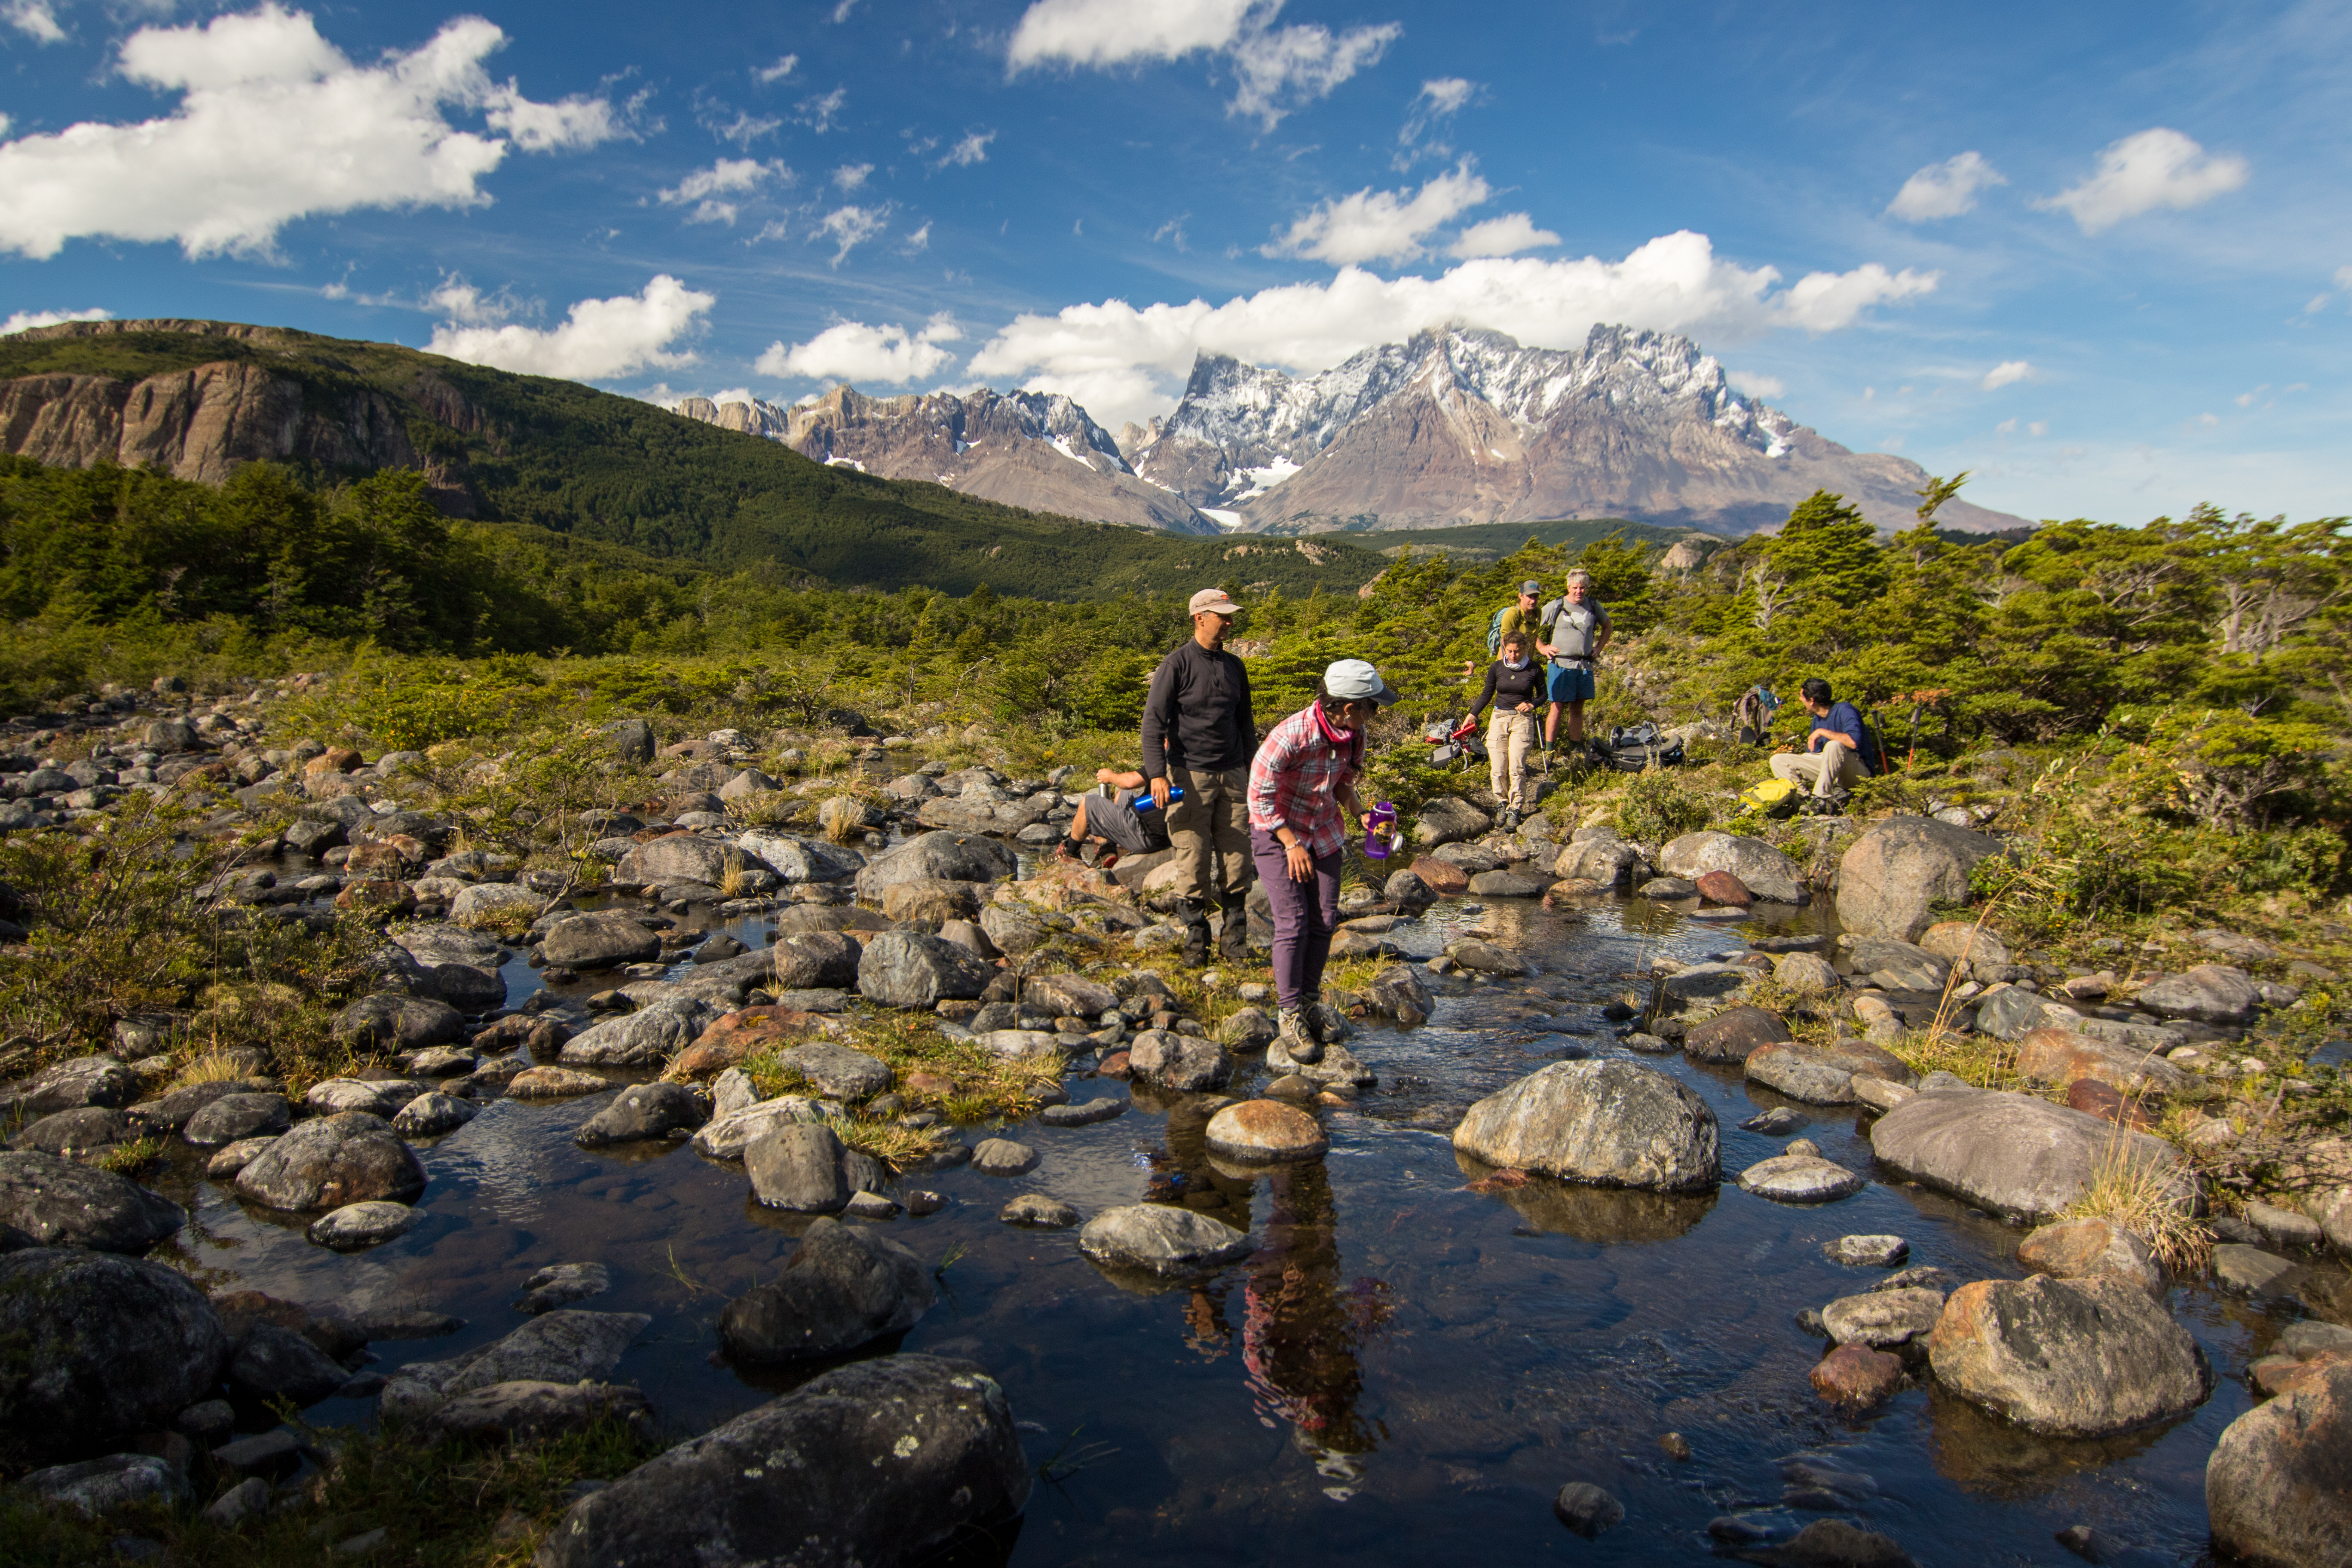 #Torres del Paine